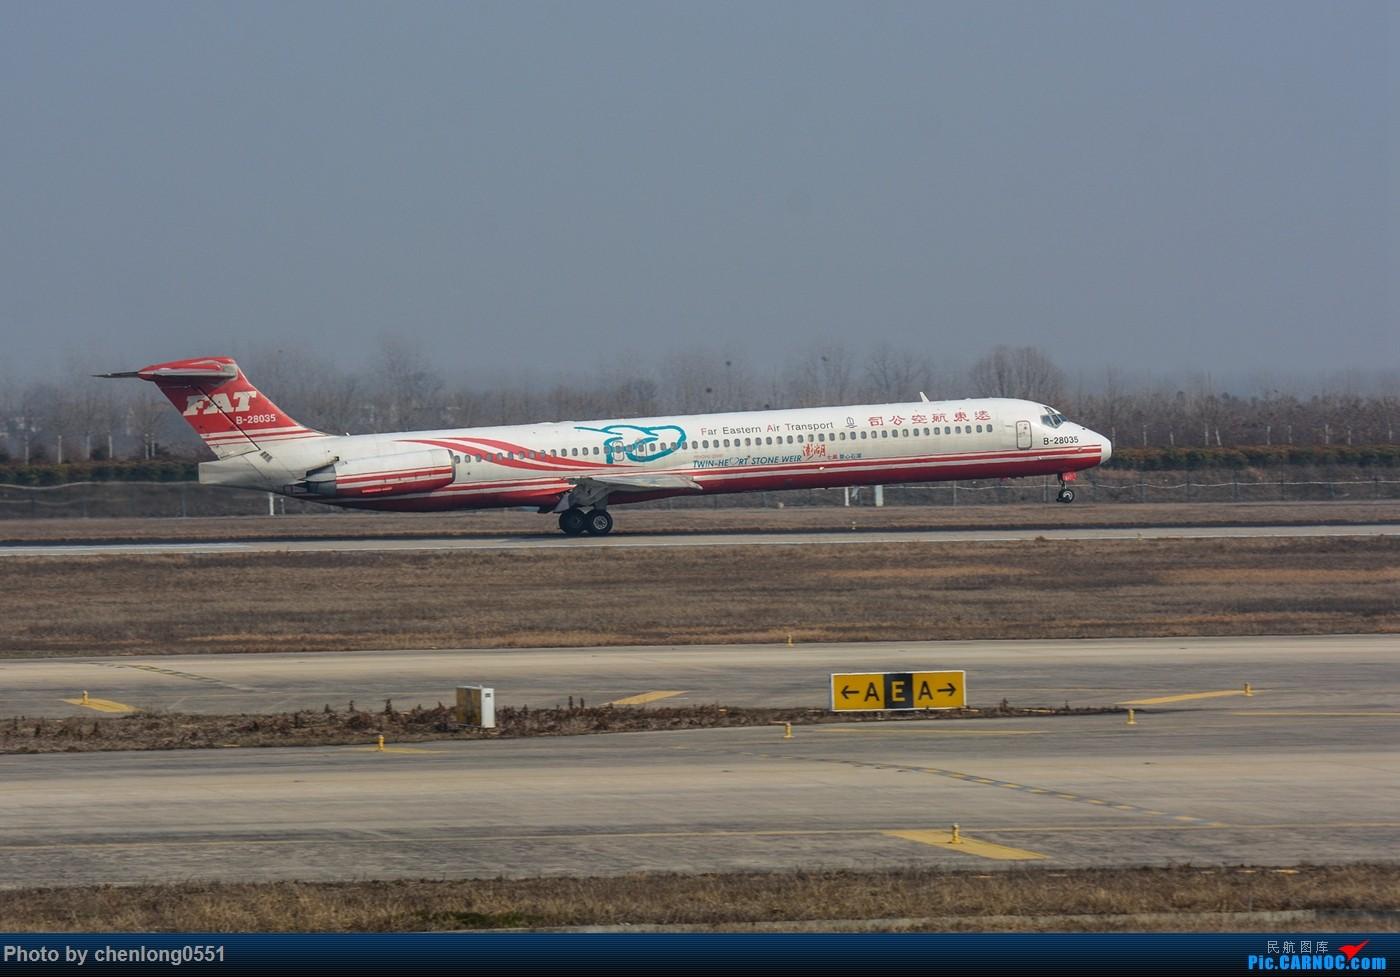 Re:【合肥飞友会·霸都打机队】好久好久没发图了,发几个19年年会的照片,几乎都是没见过的机 MD MD-80-82 B-28035 中国合肥新桥国际机场